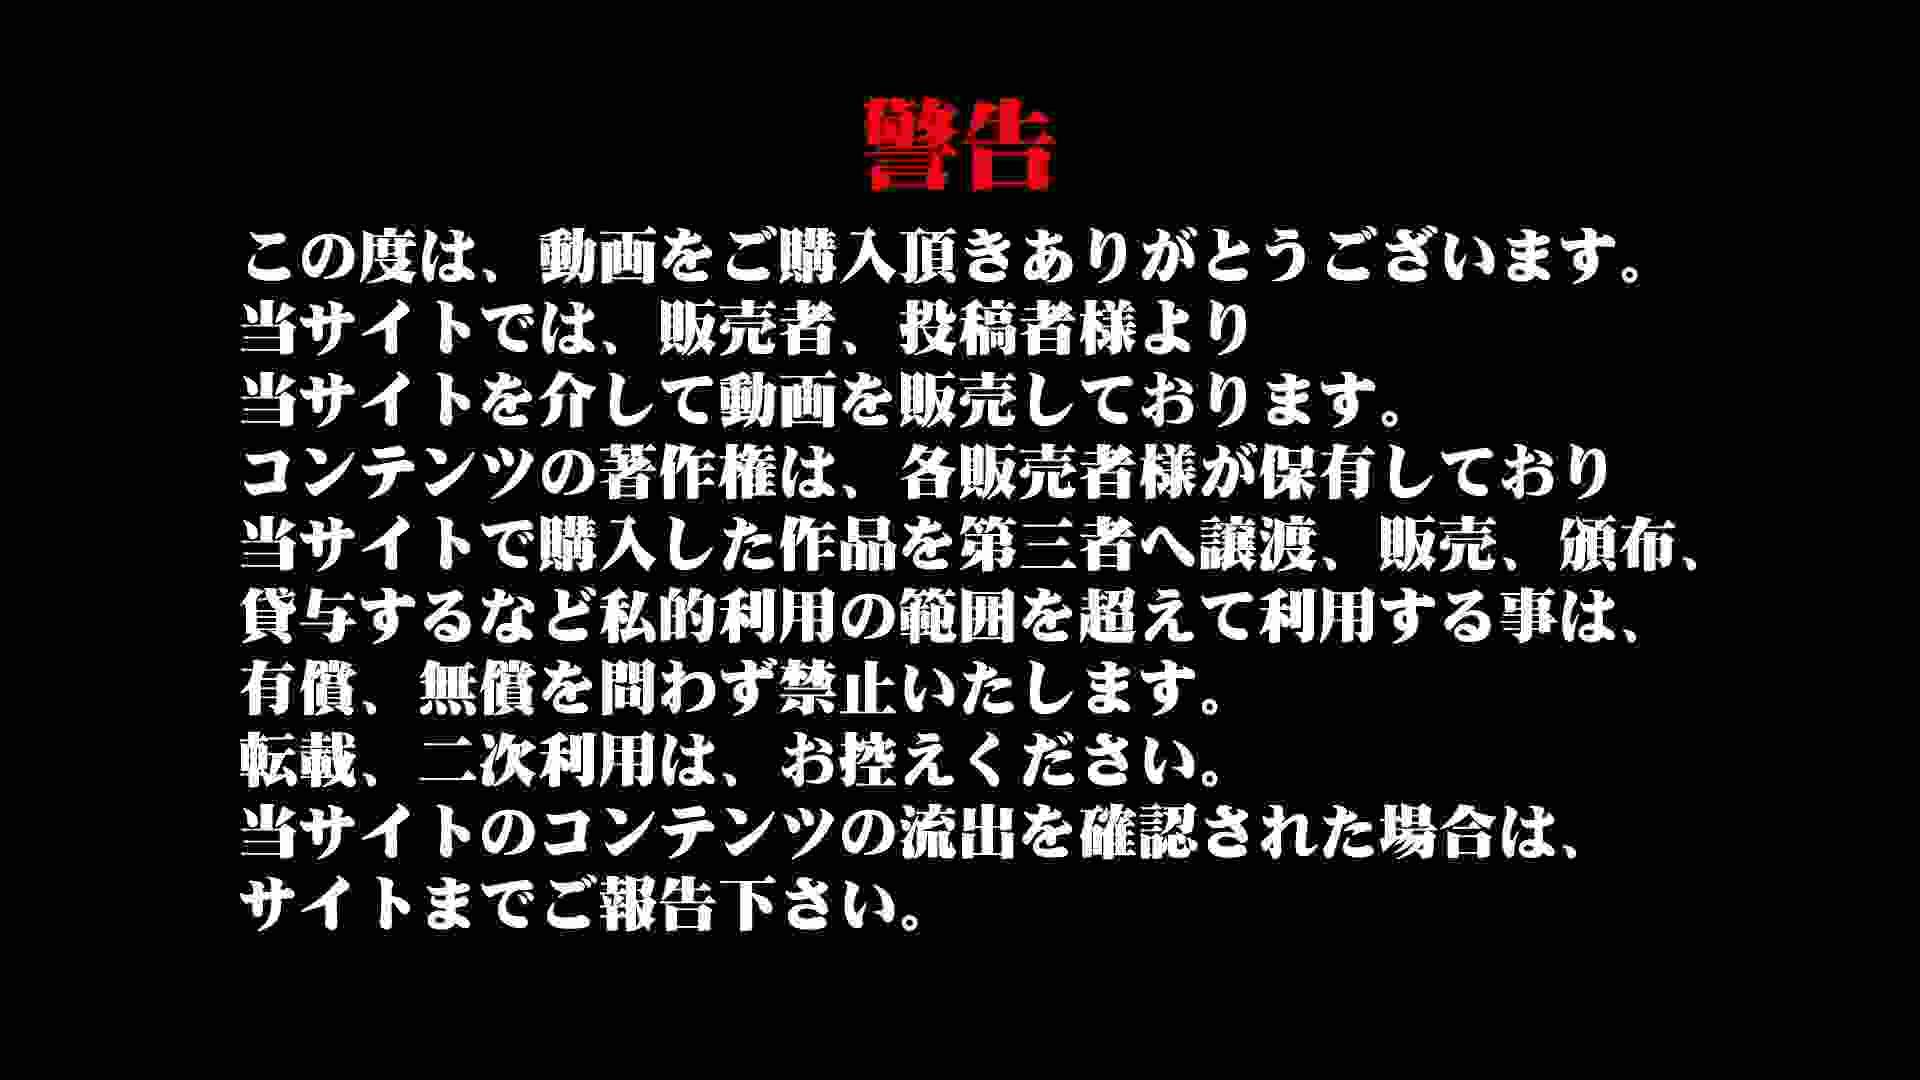 Aquaな露天風呂Vol.924 盗撮シリーズ | 露天風呂編  108PIX 3